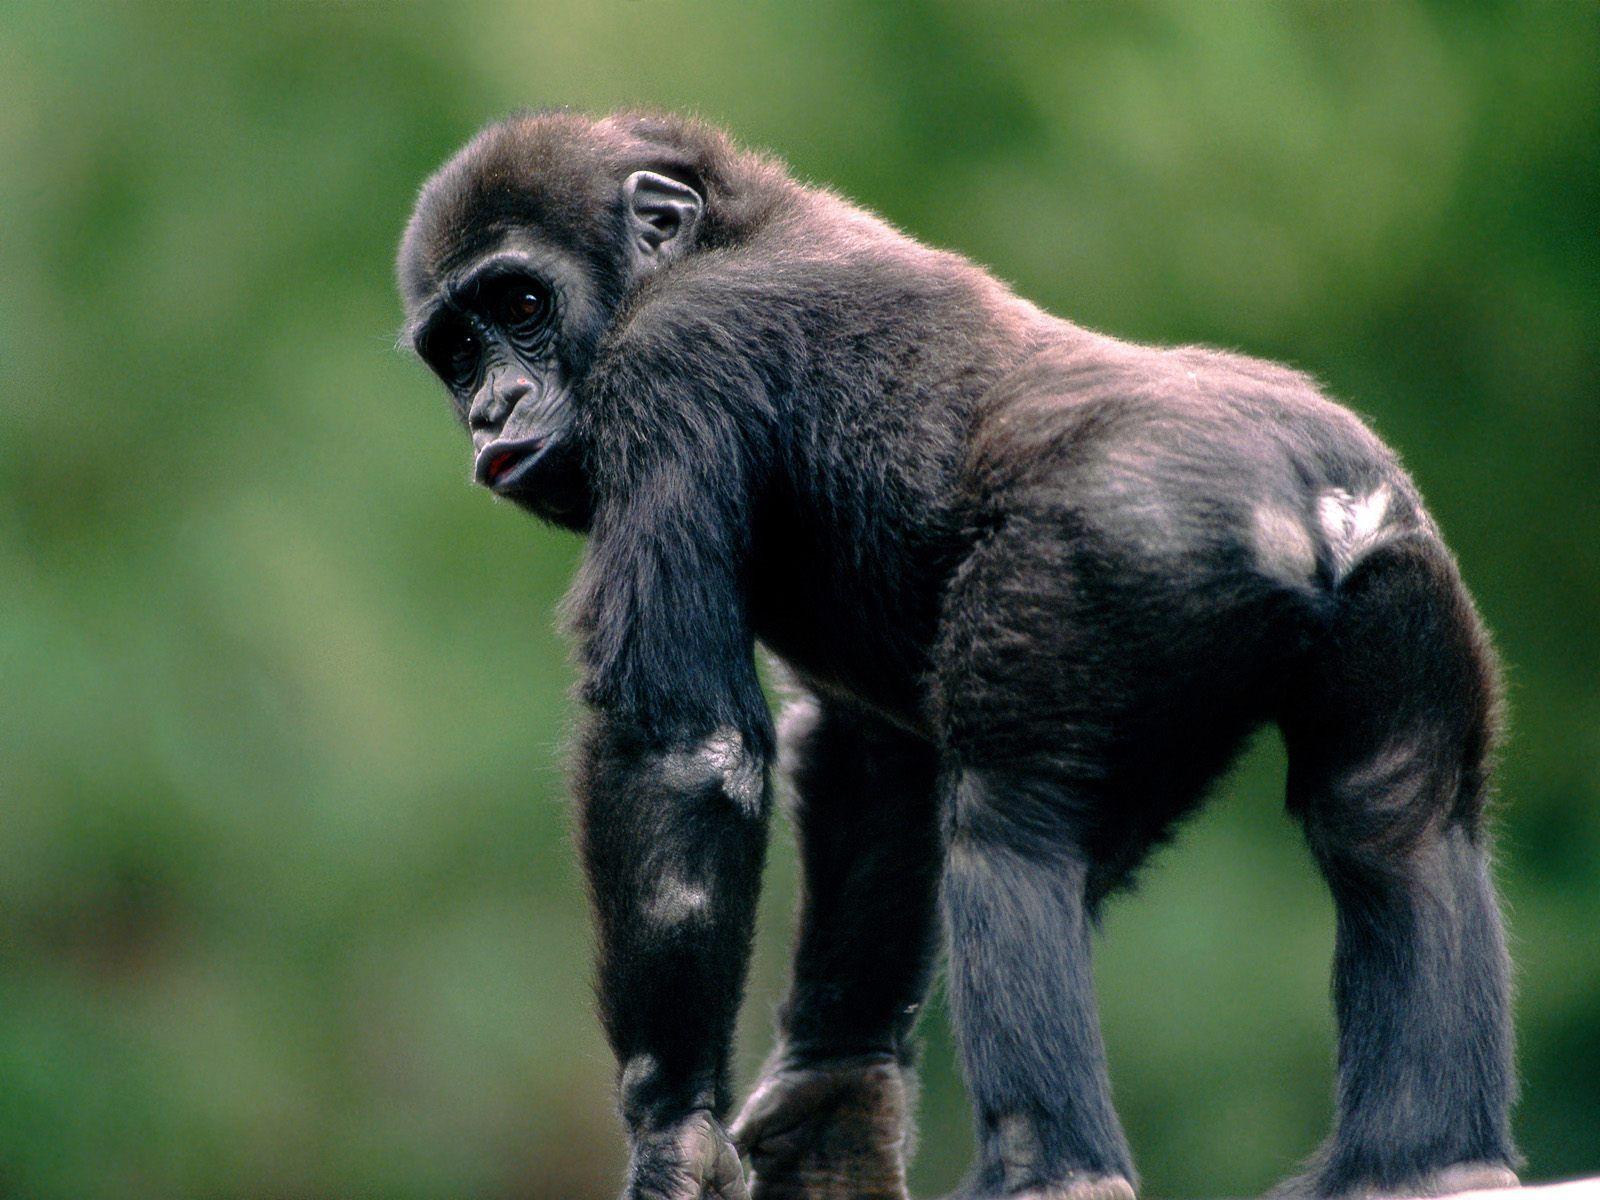 3d animals wallpaper ape - photo #4